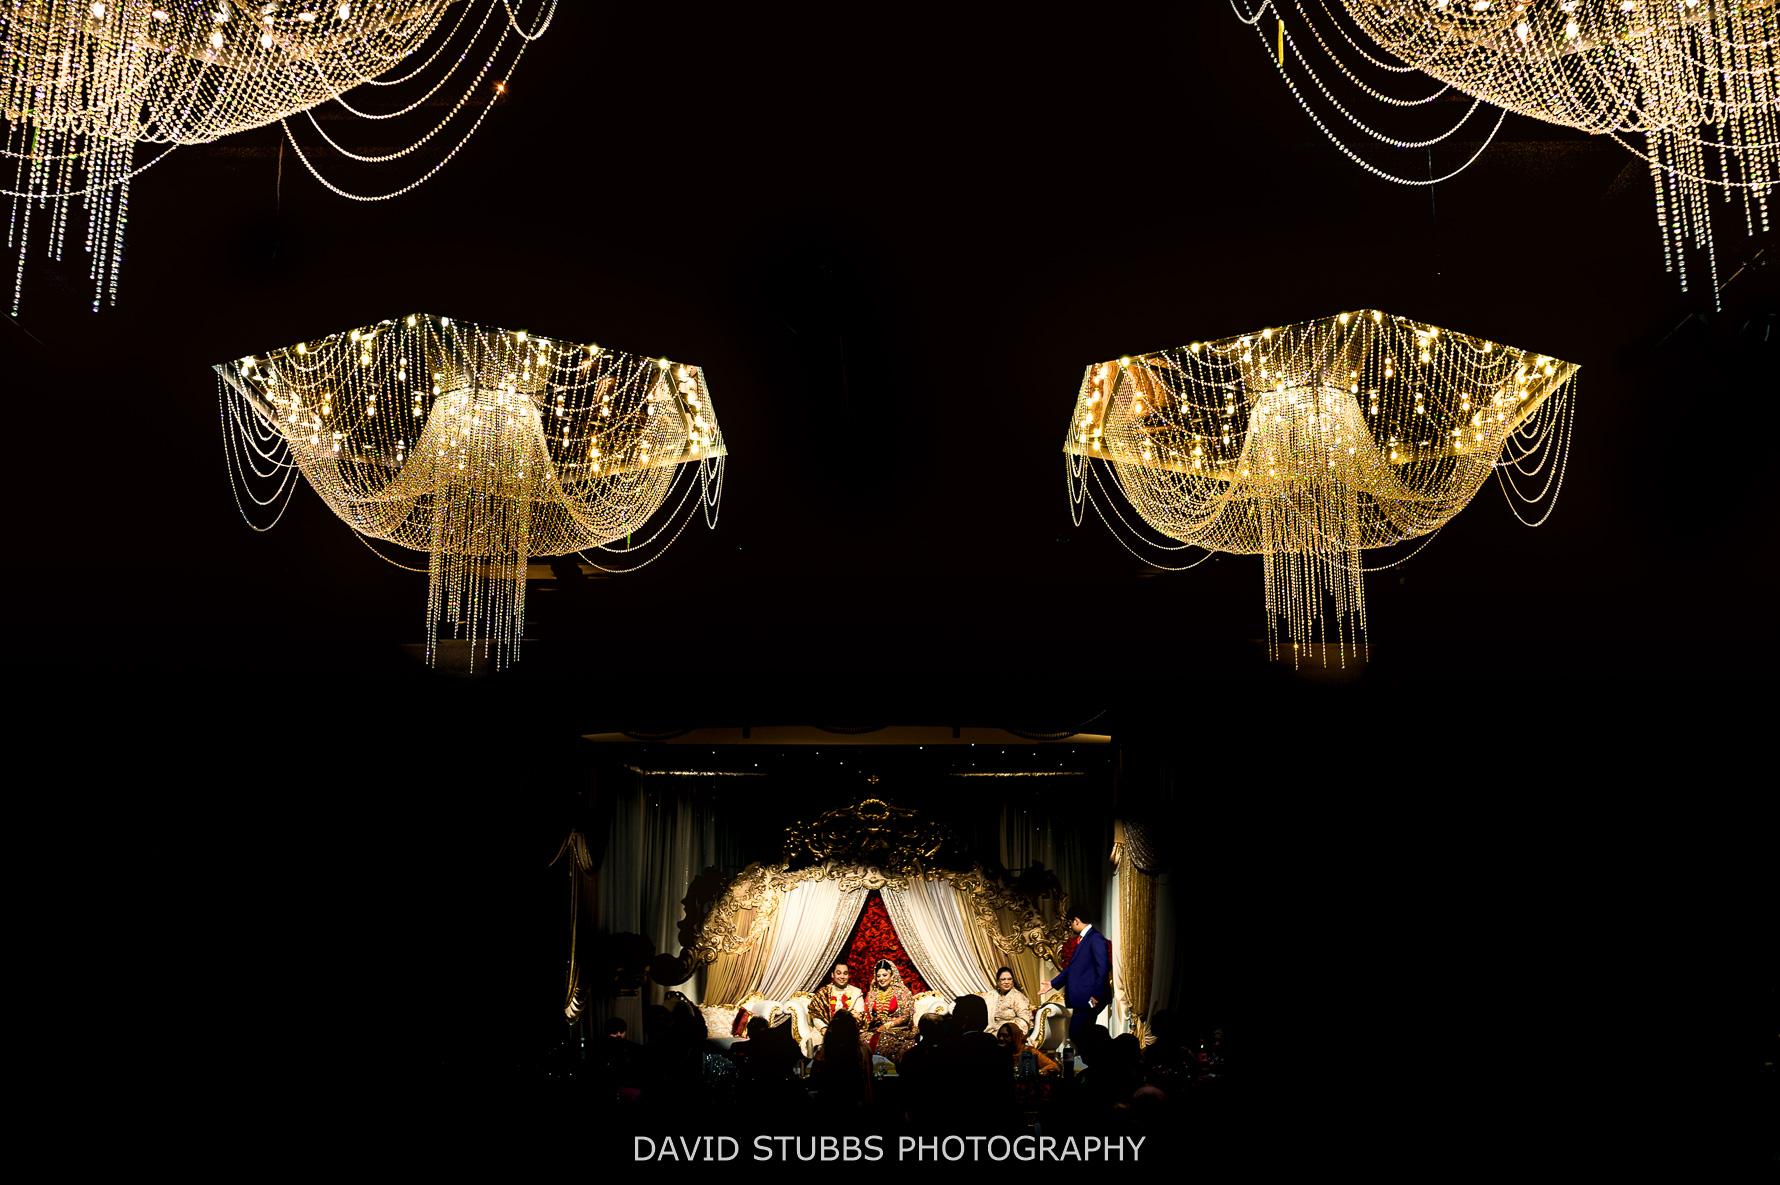 David-Stubbs-Photography-30